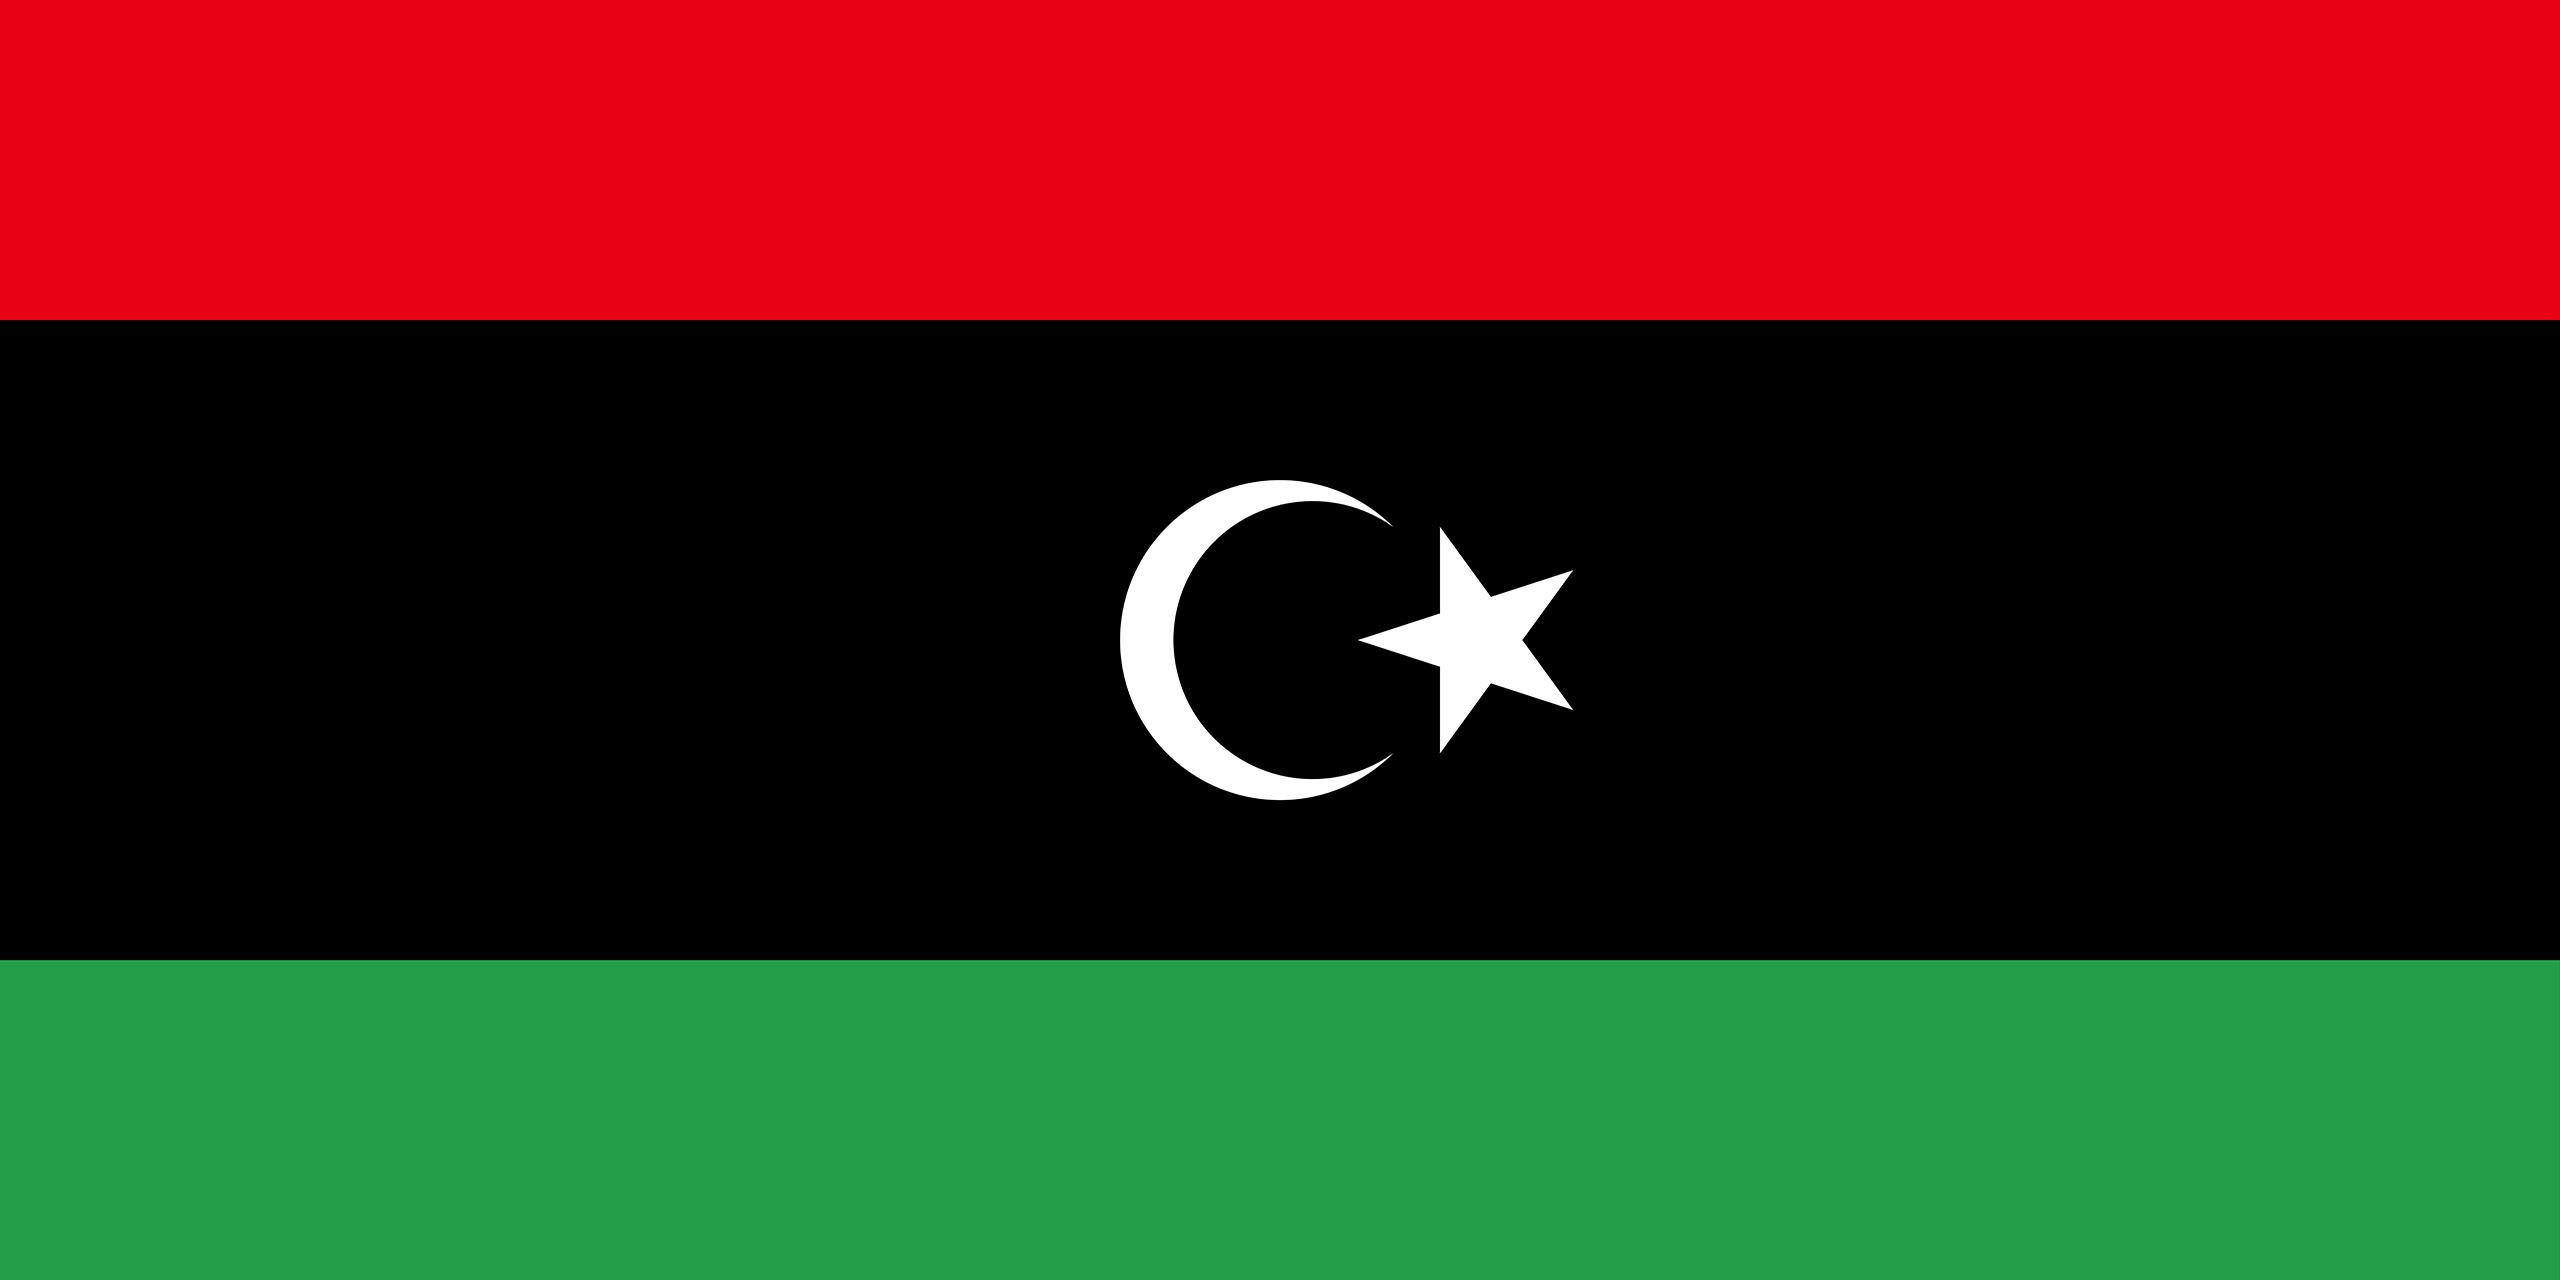 Libye, pays, emblème, logo, symbole - Fonds d'écran HD - Professor-falken.com